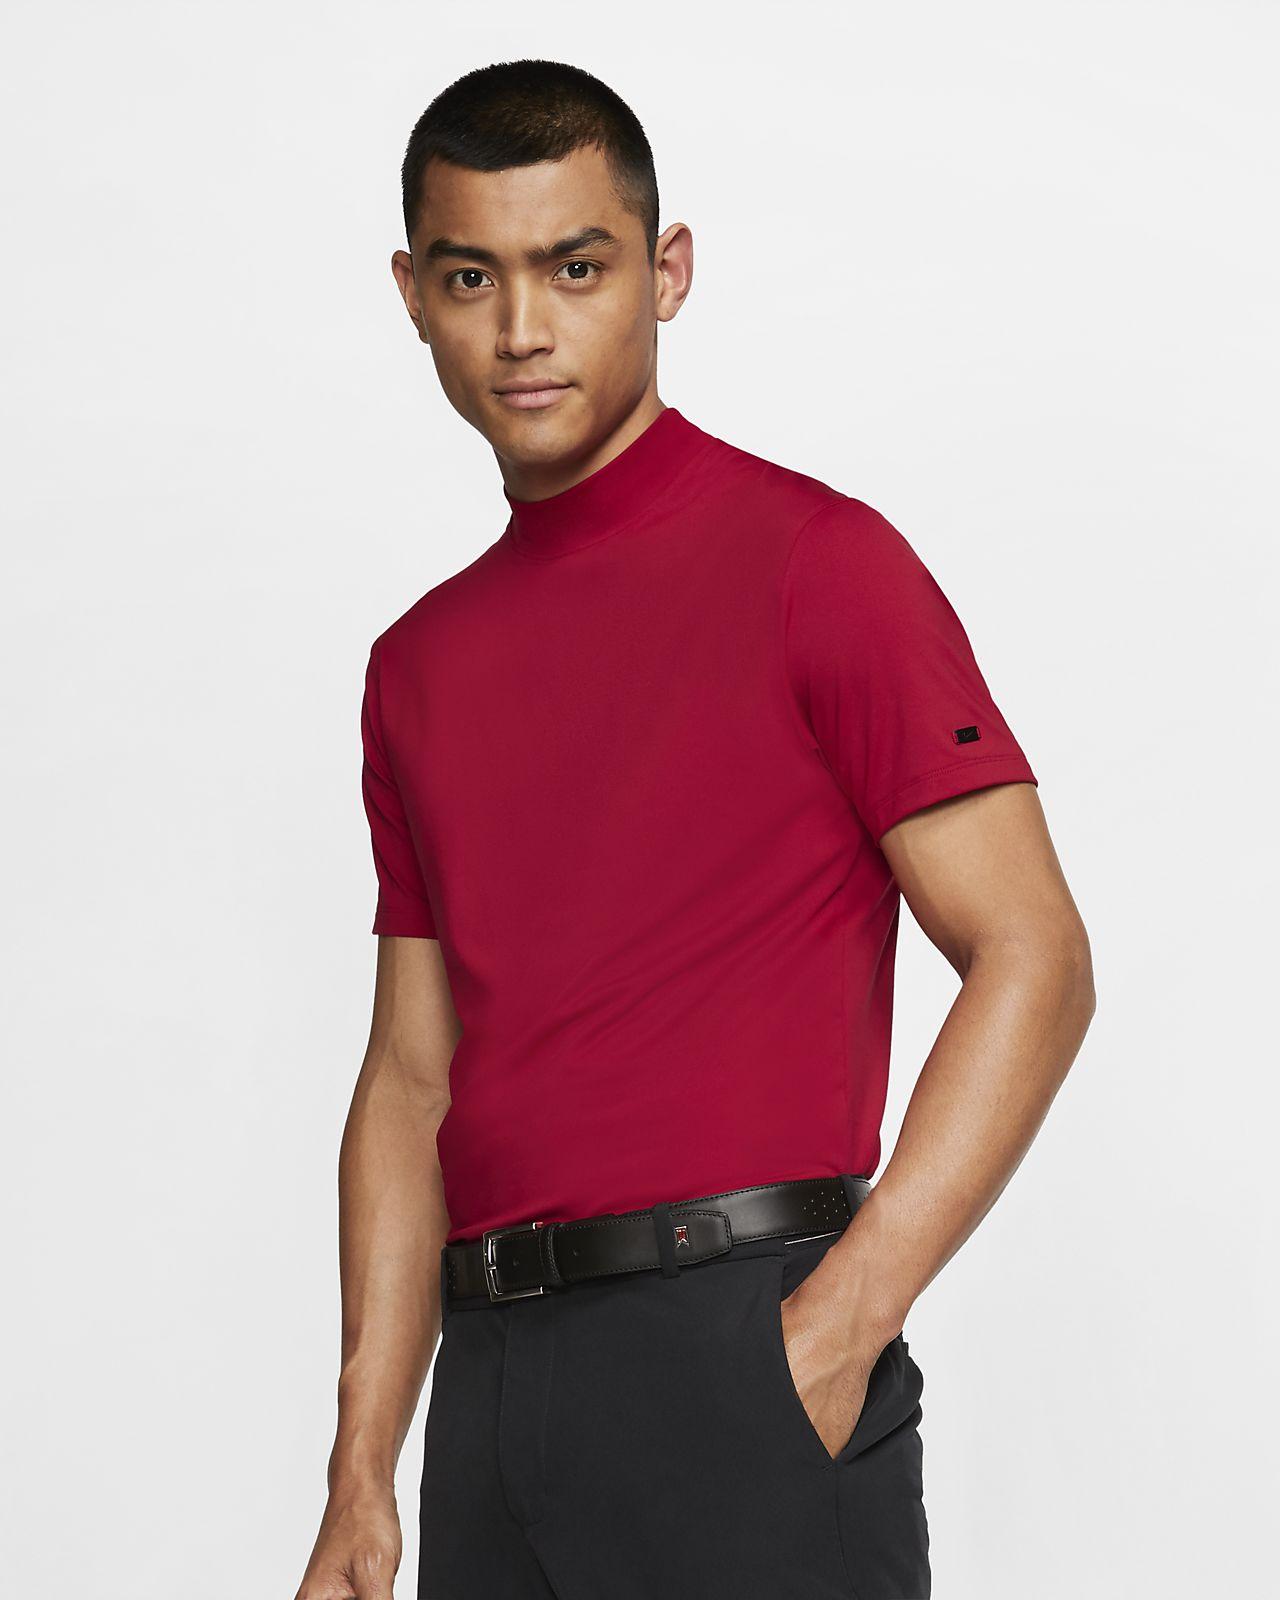 Męski półgolf do golfa Nike Dri-FIT Tiger Woods Vapor